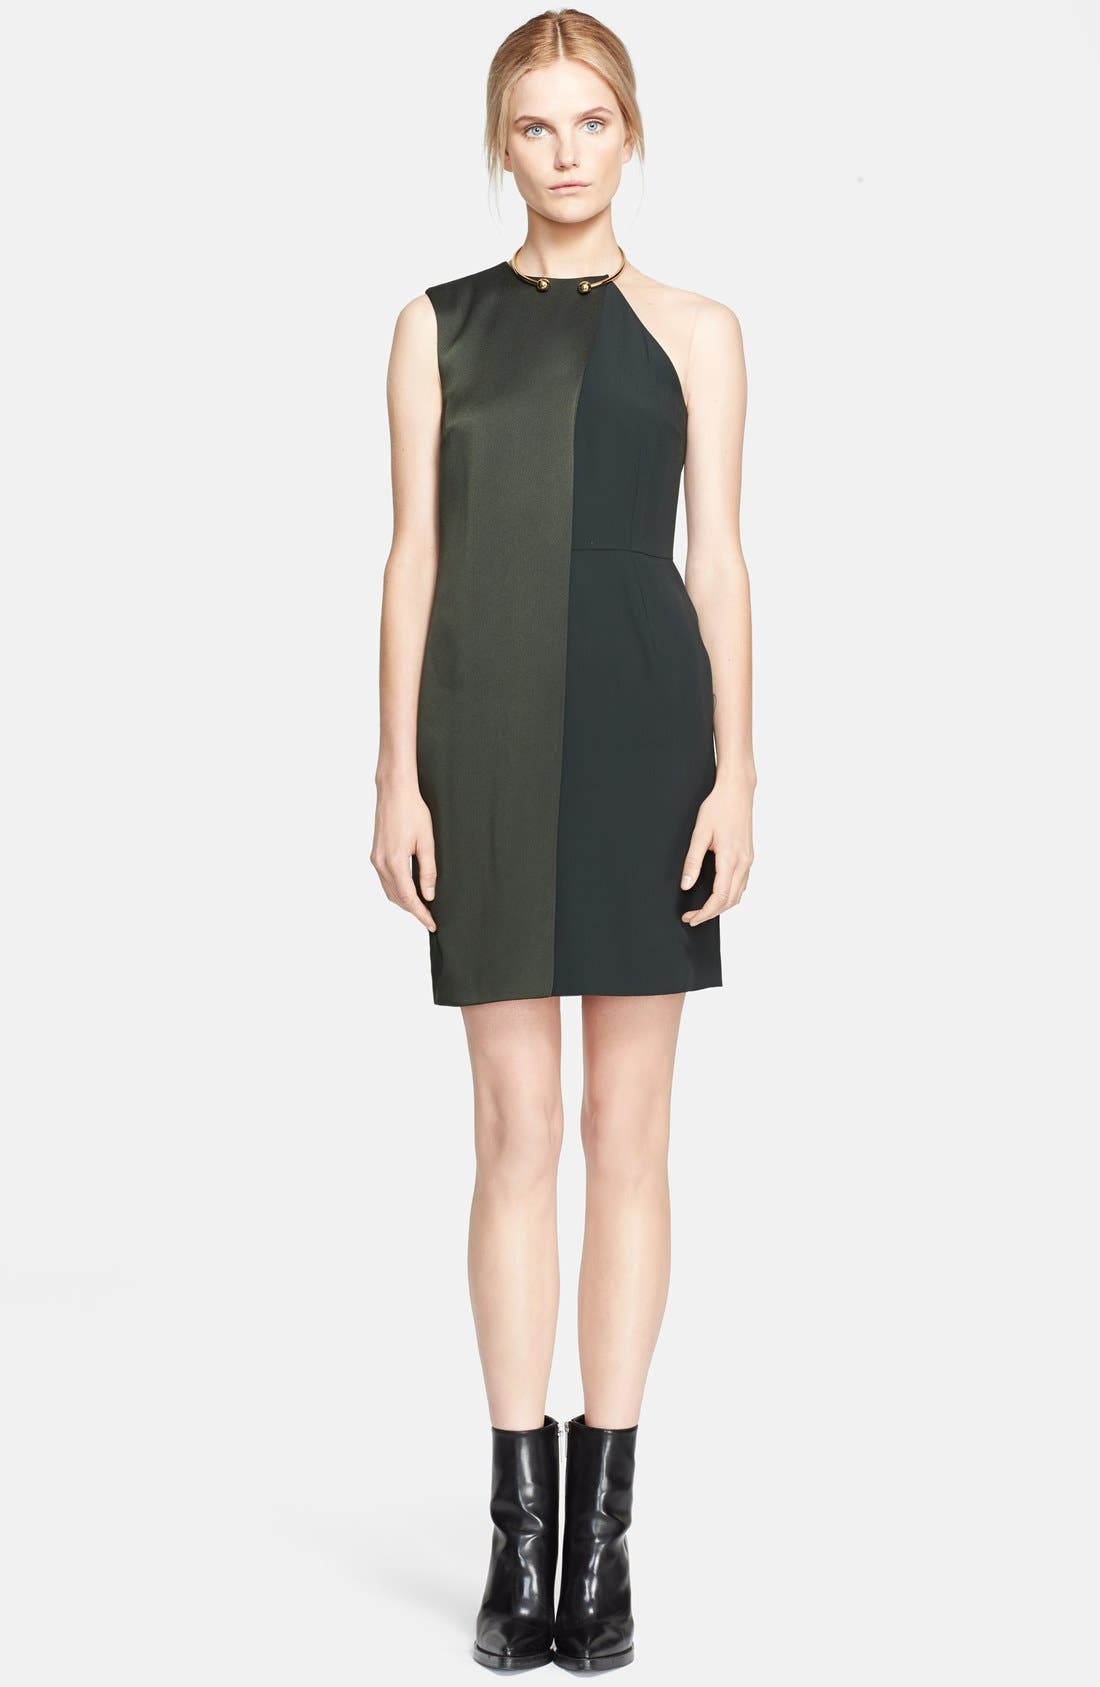 Main Image - Stella McCartney Sable Crepe & Satin Dress with Neck Hardware